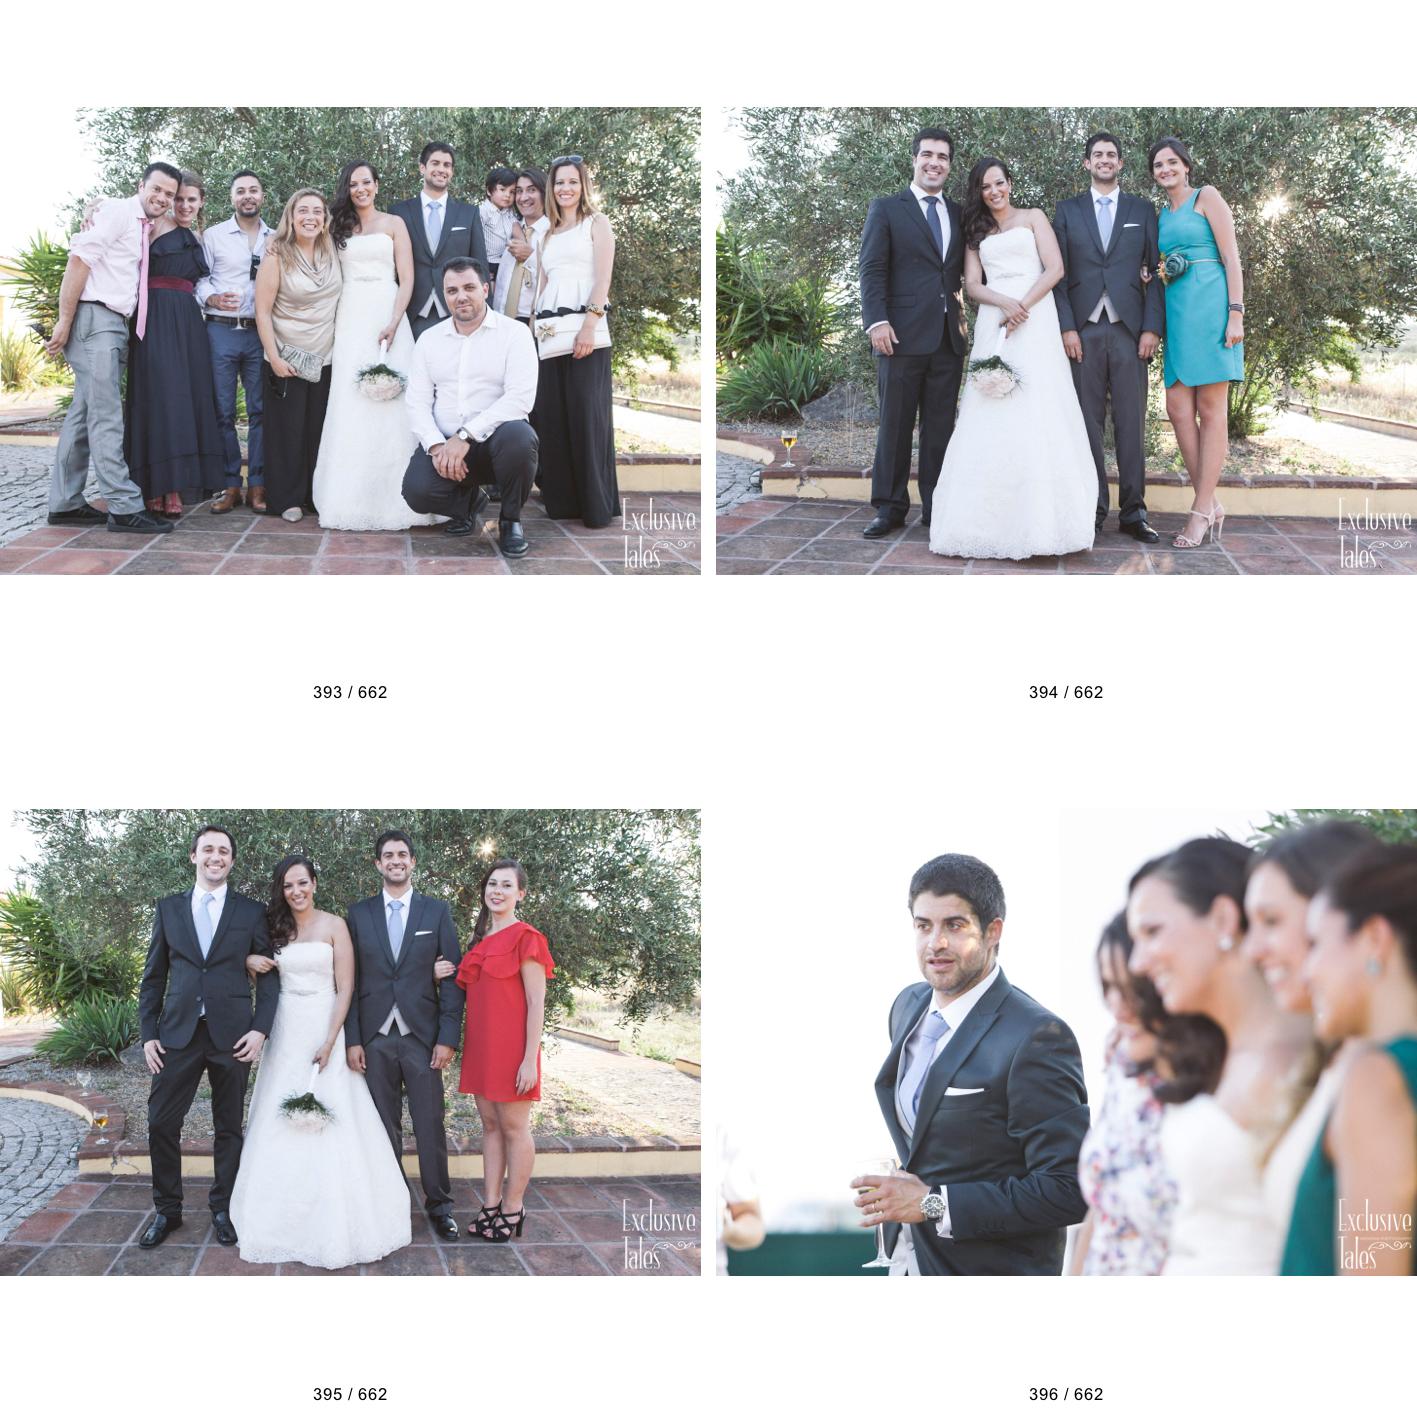 LT_provas-099.jpg